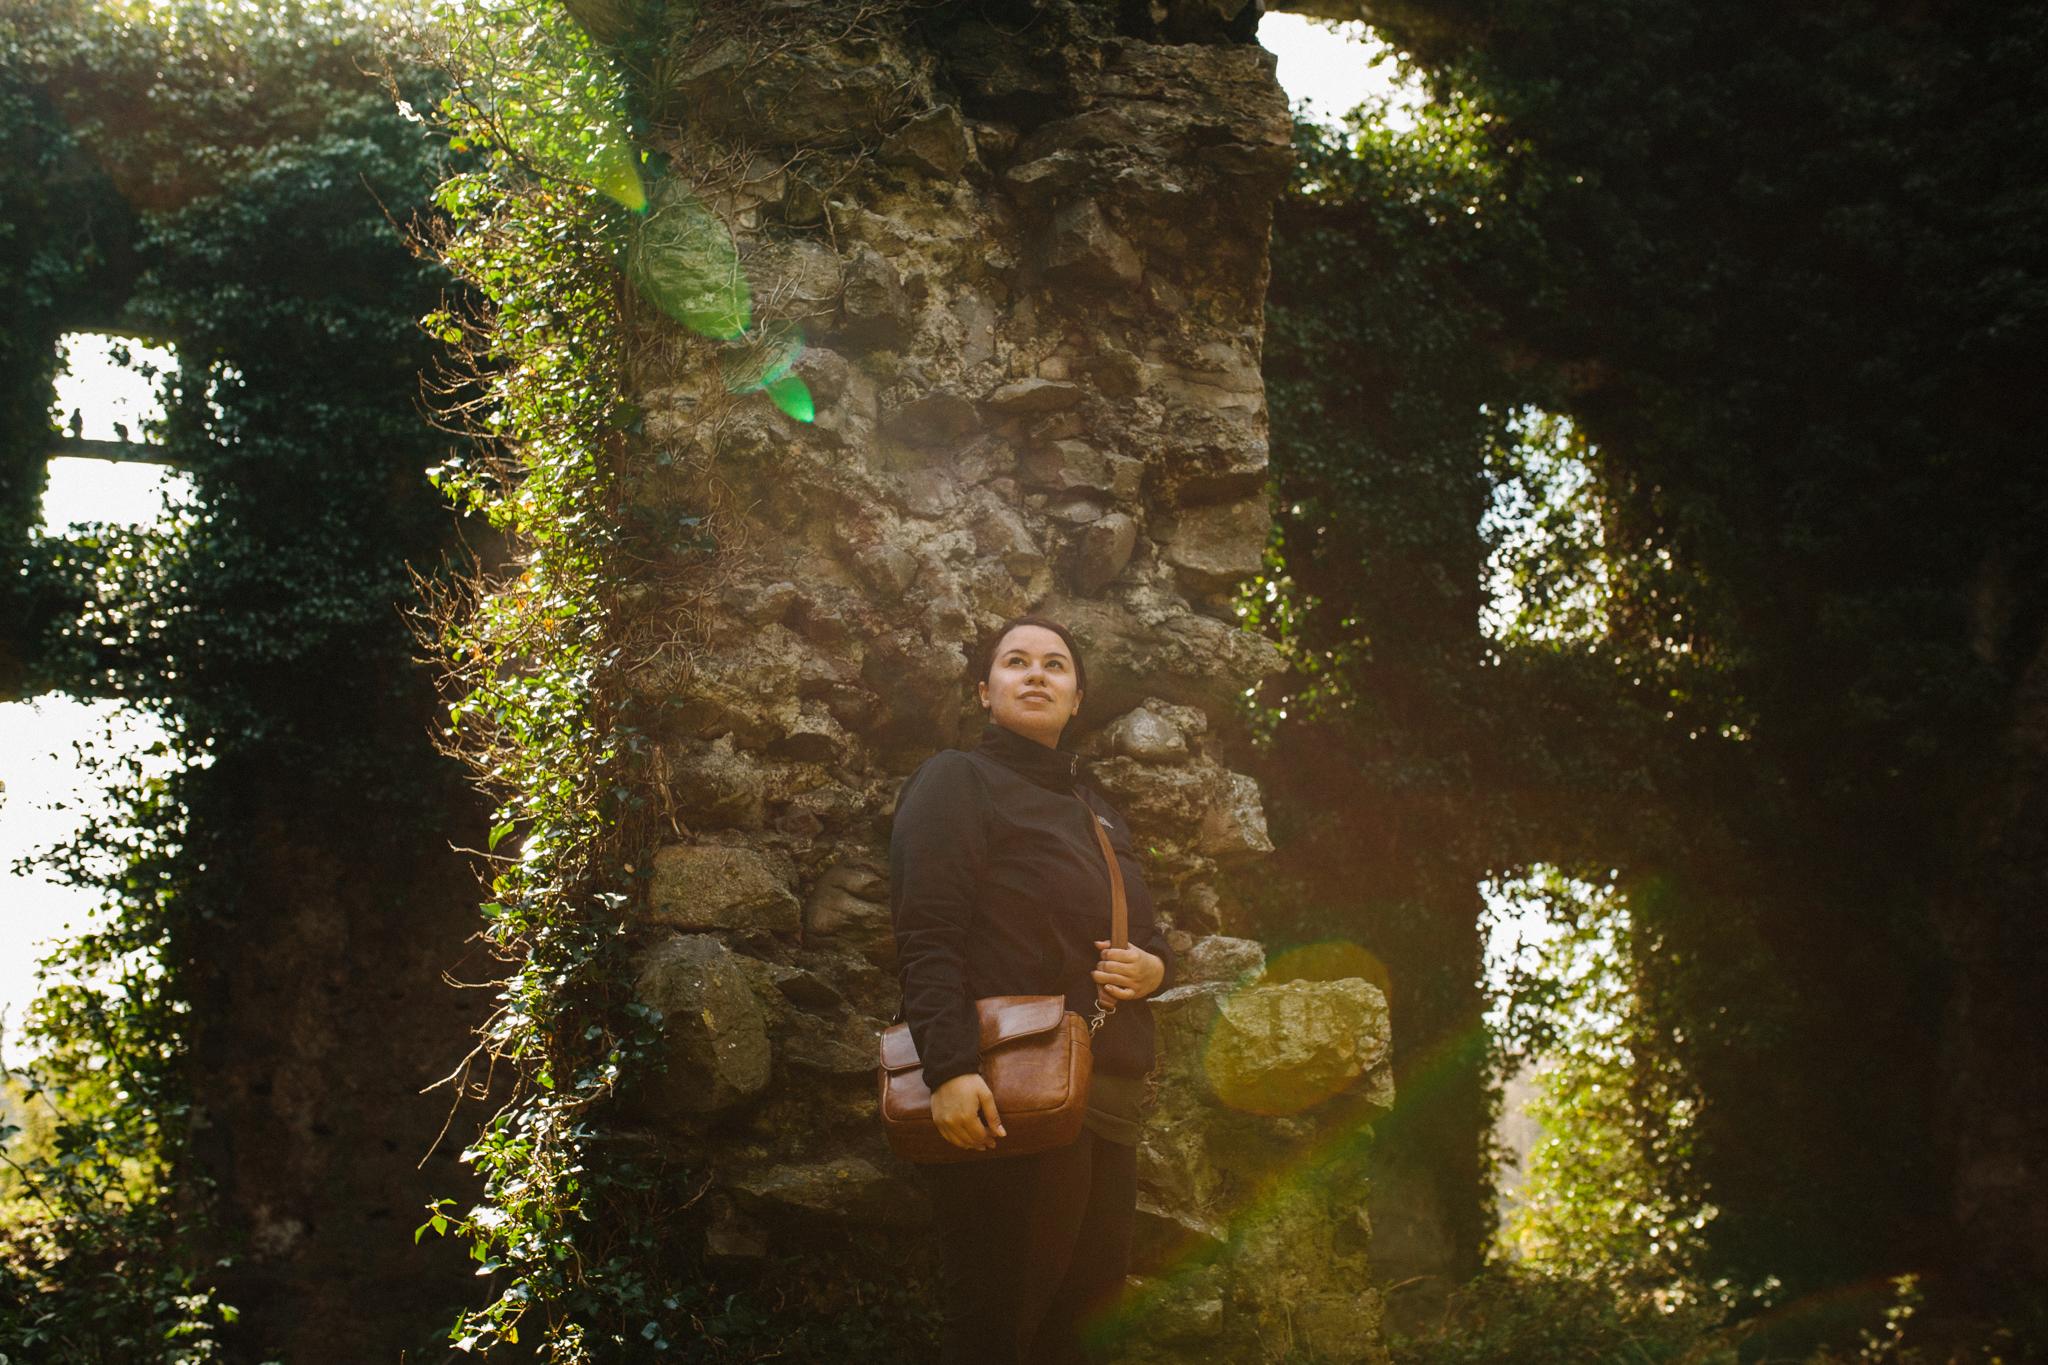 ireland_galway_dublin_rebecca_burt_photography-18.jpg